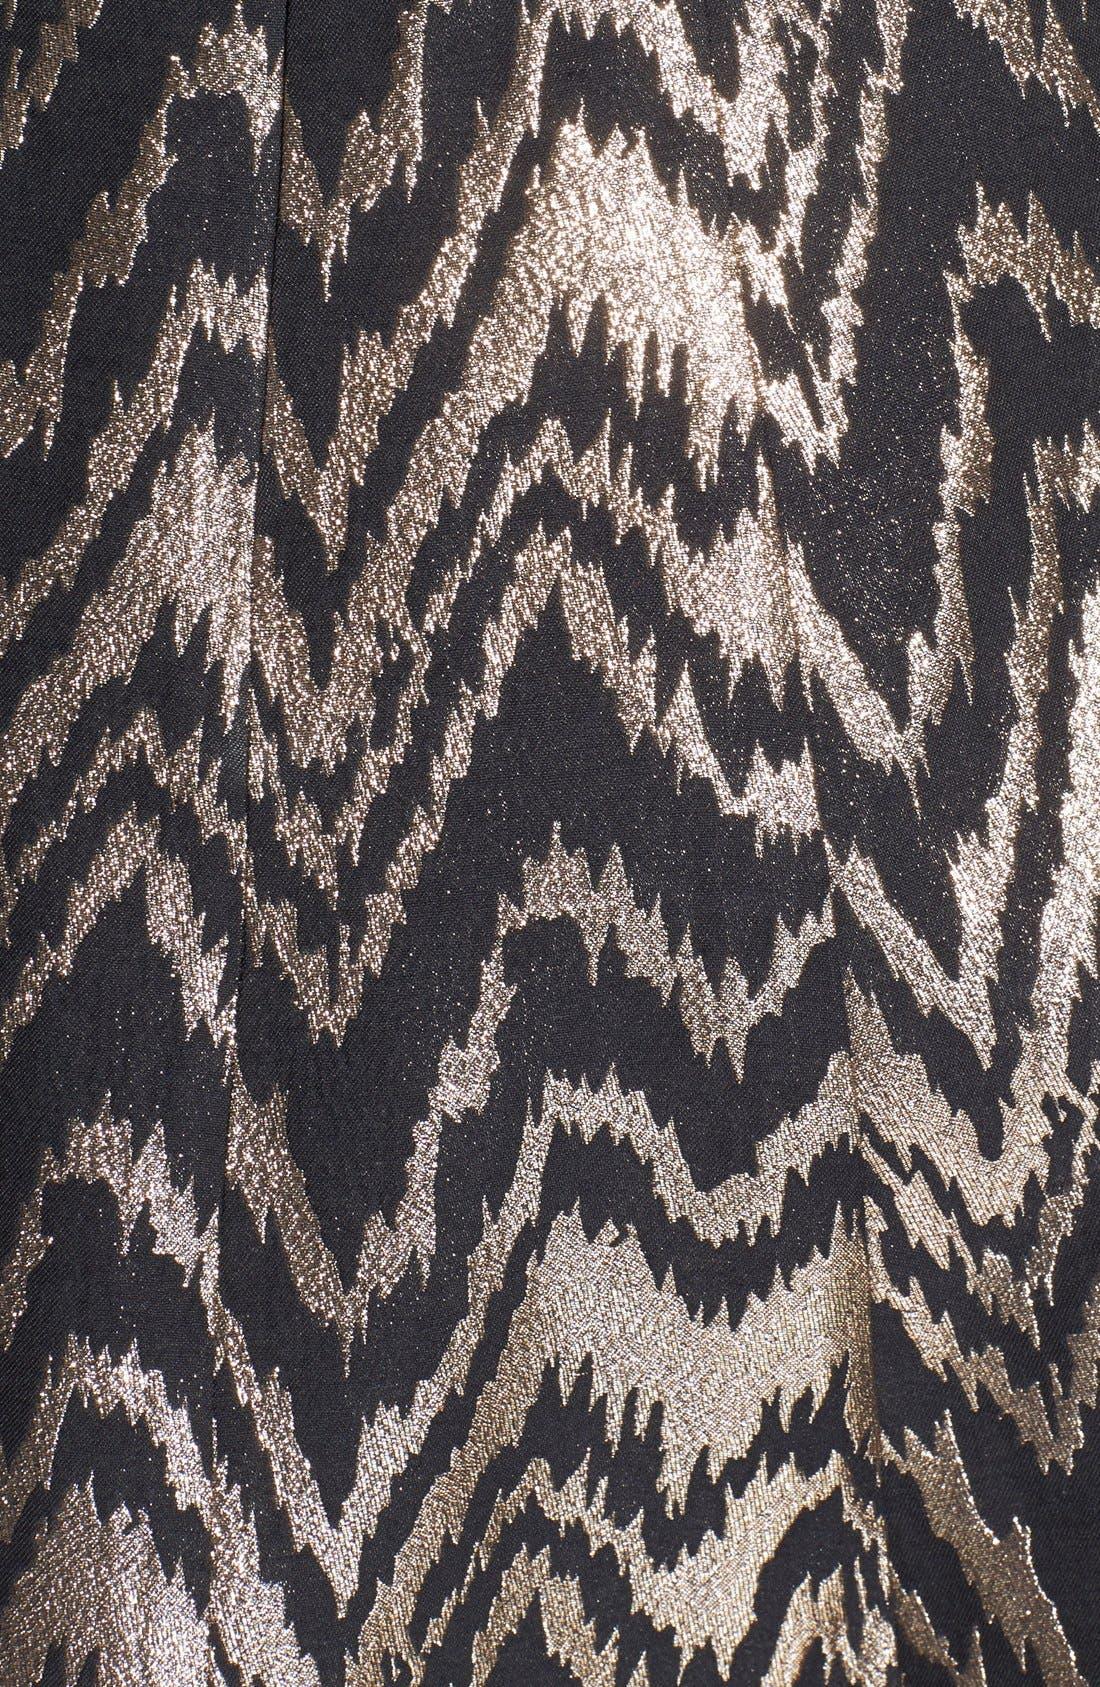 VINCE CAMUTO,                             Metallic Jacquard Fit & Flare Dress,                             Alternate thumbnail 3, color,                             226